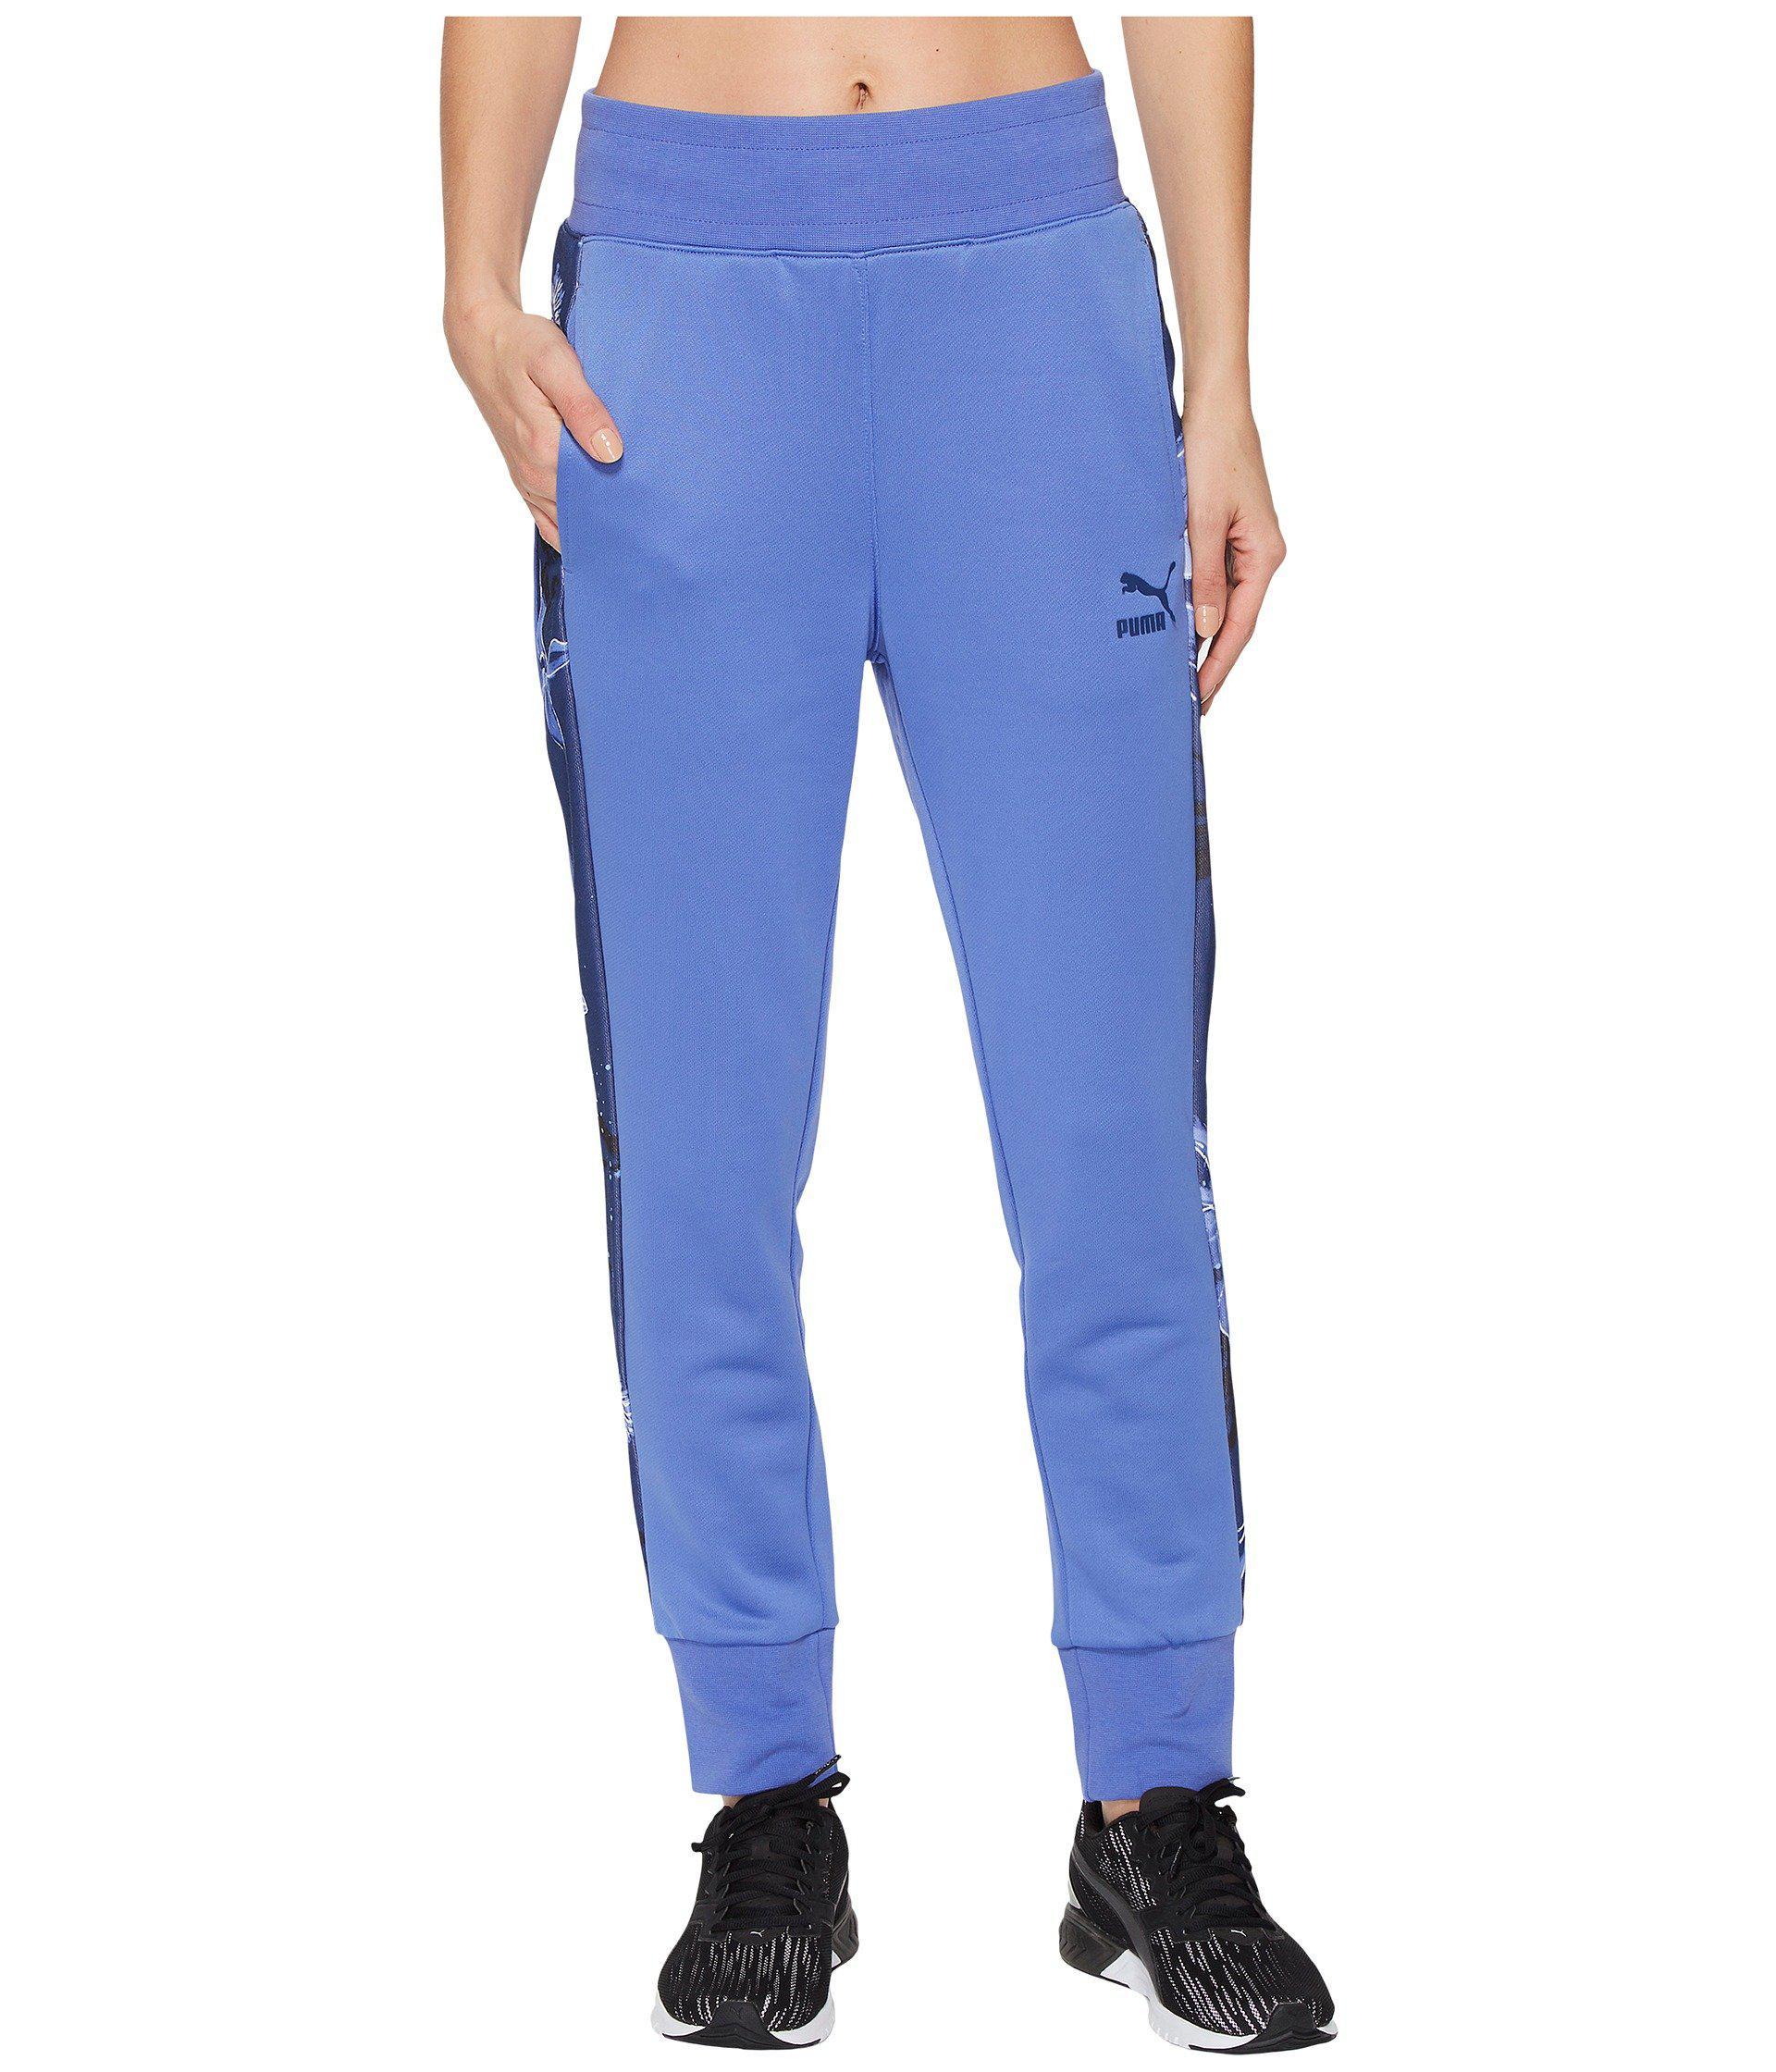 biggest discount 23409 5ca36 PUMA - Blue Archive T7 Track Pants for Men - Lyst. View fullscreen